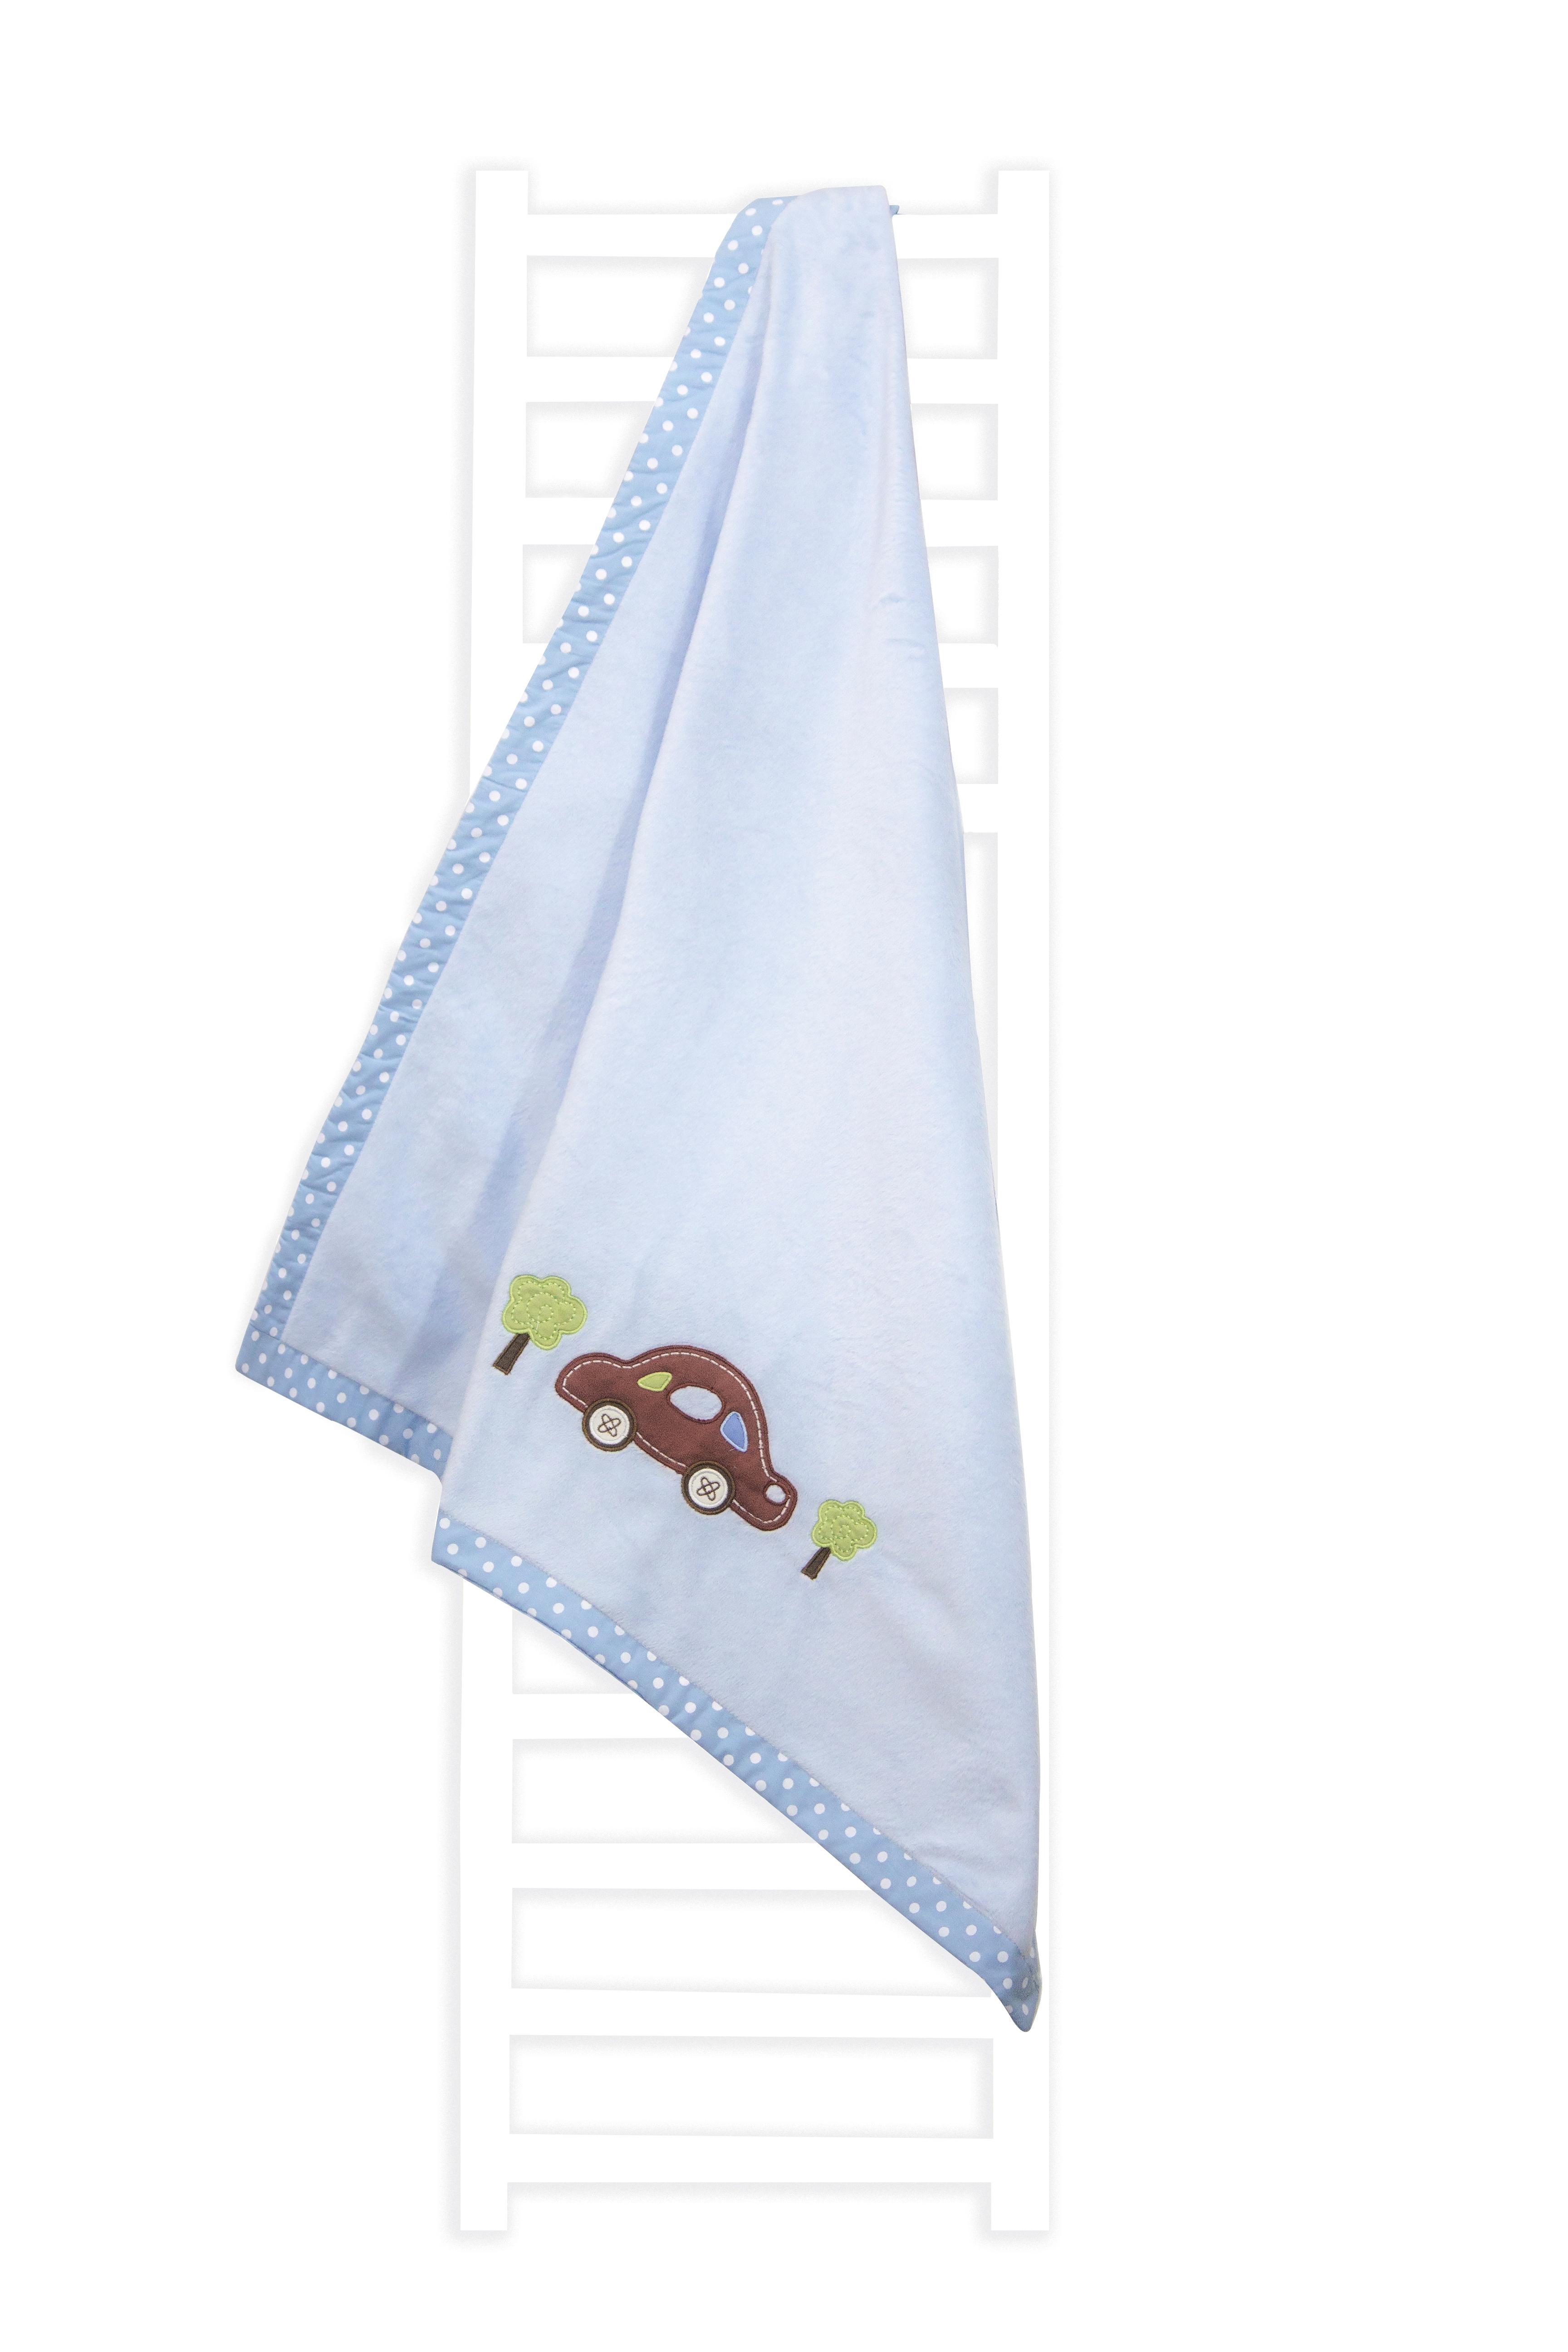 Mothercare   Abracadabra Plush Blanket - Transport